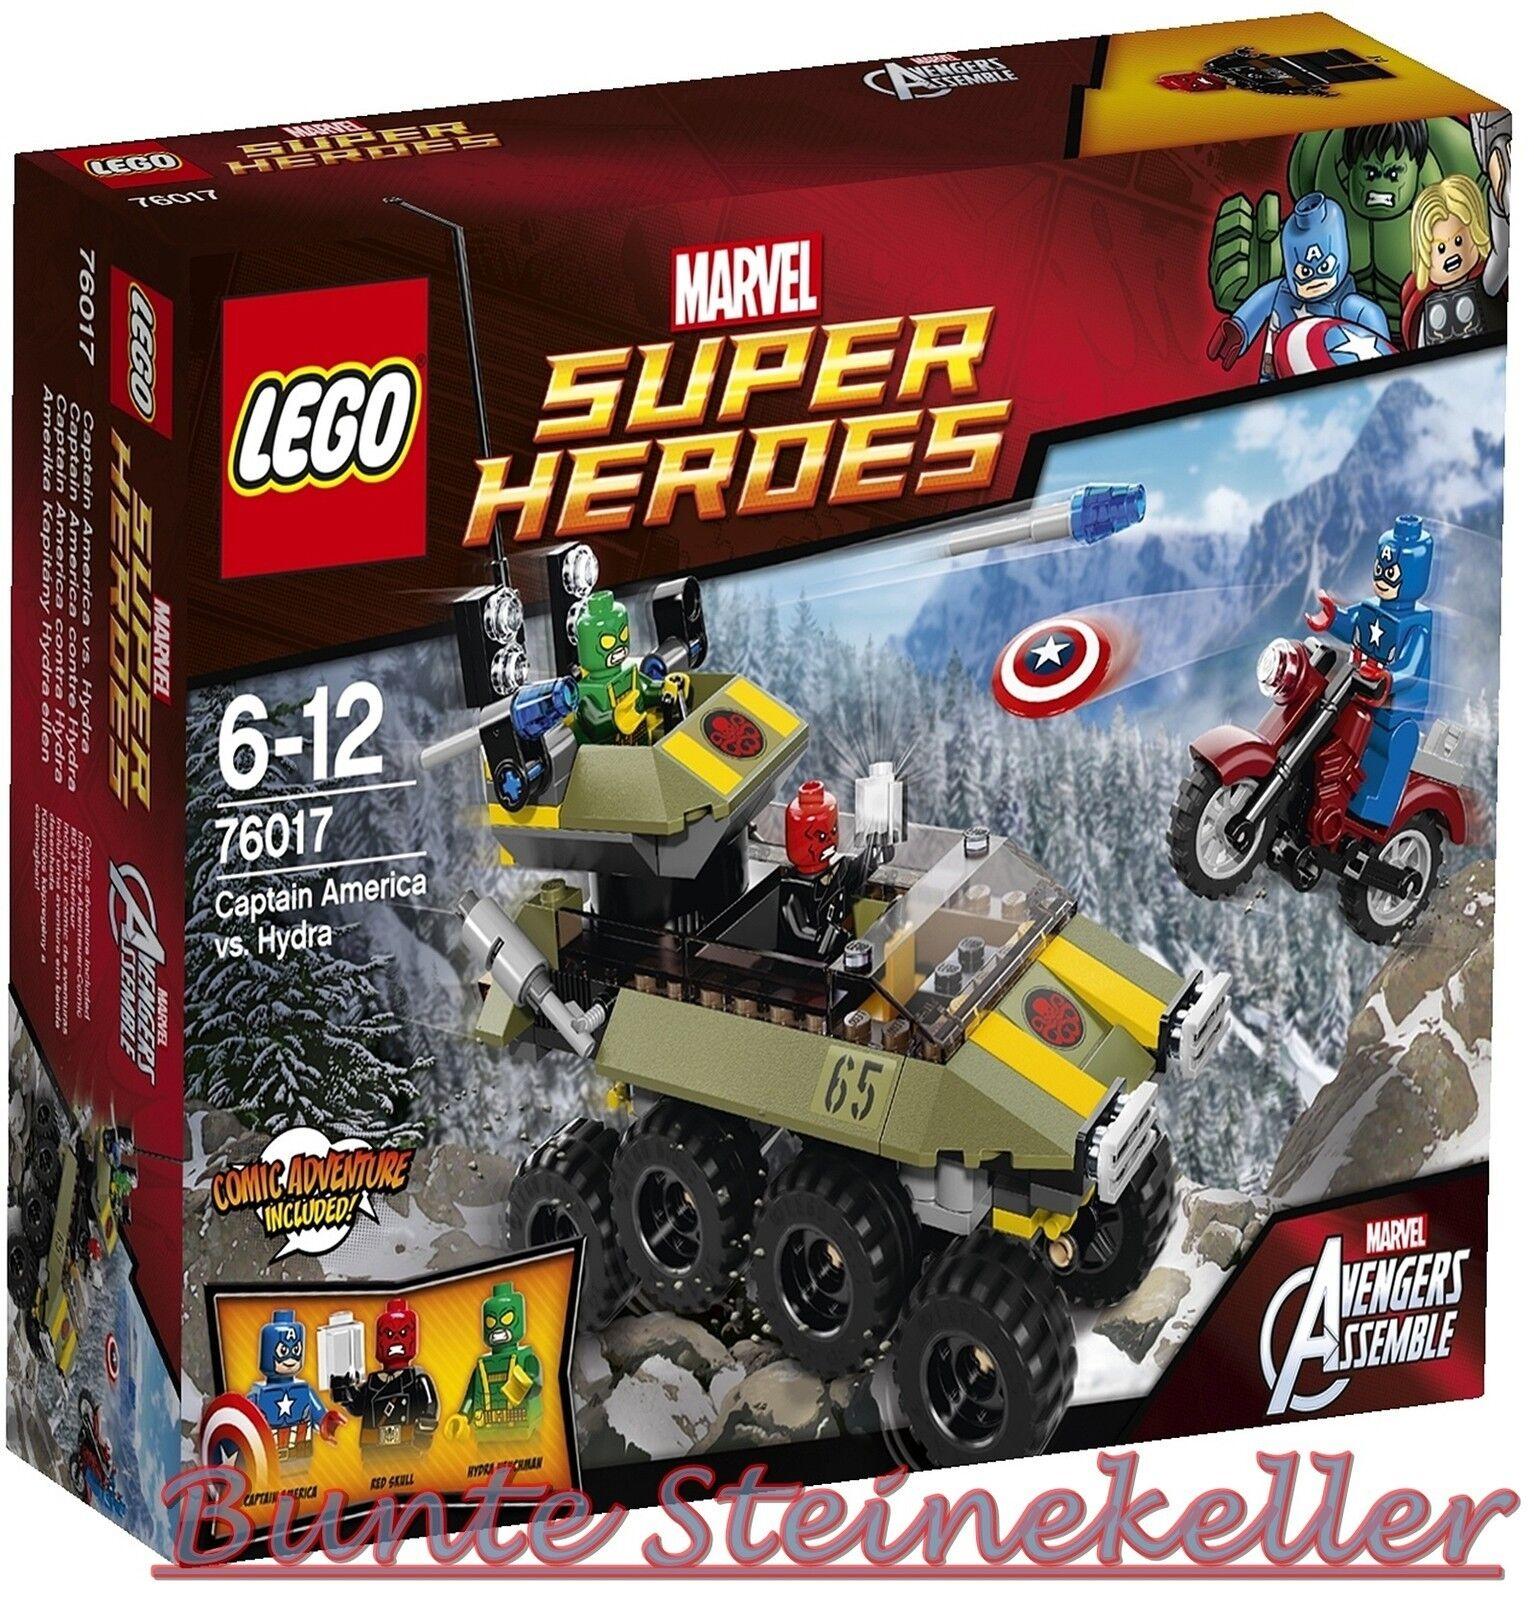 LEGO ® ® ® super heroes marvel: 76017 Capitaine America vs. Hydra & 0. -€ expédition & nouveau c2145a